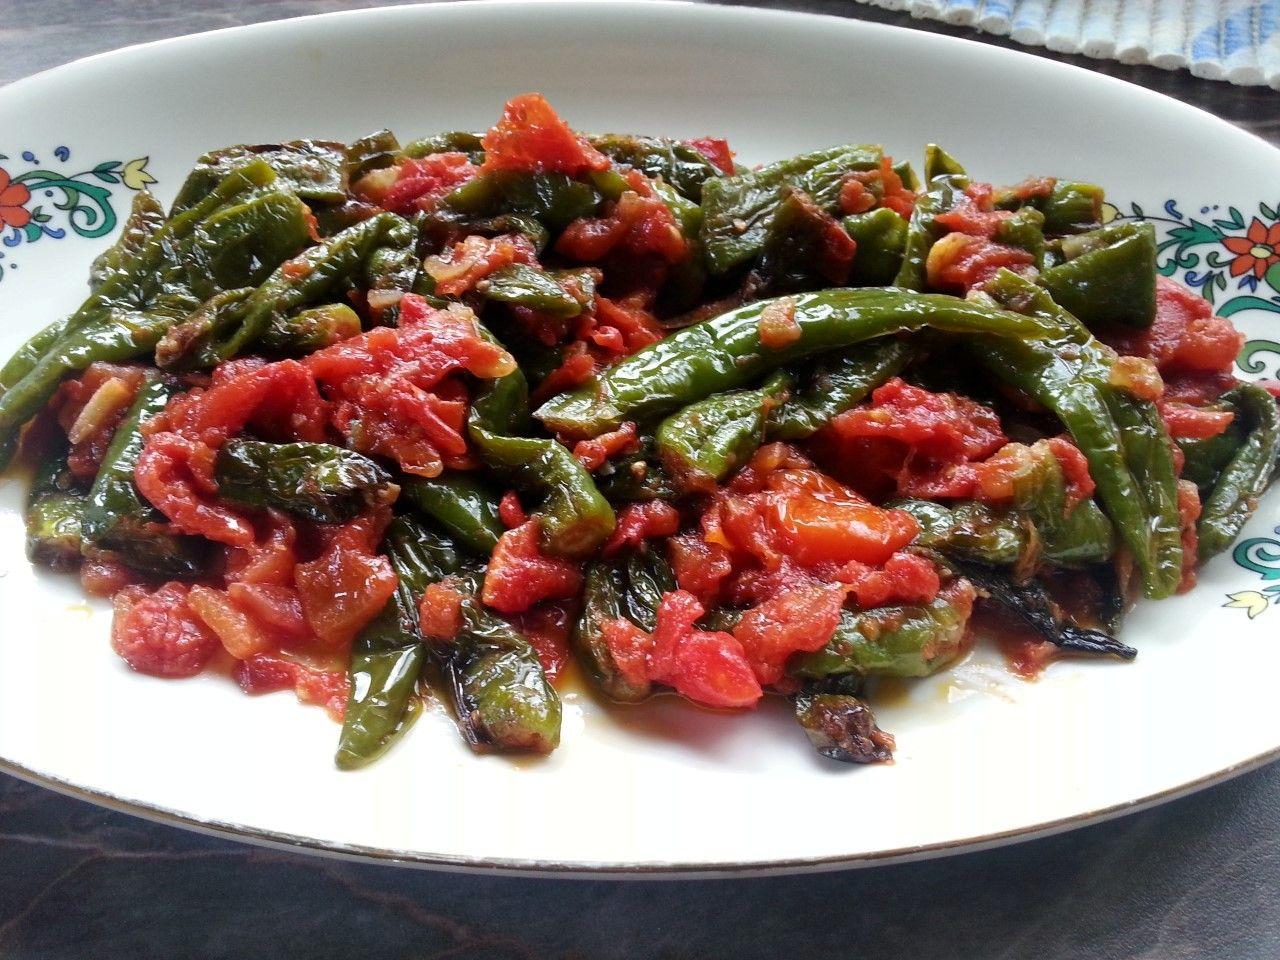 Pimientos con salsa de tomate - Pimientos verdes con tomate - Friarielli (Peperoni) o Friggitelli al pomodoro